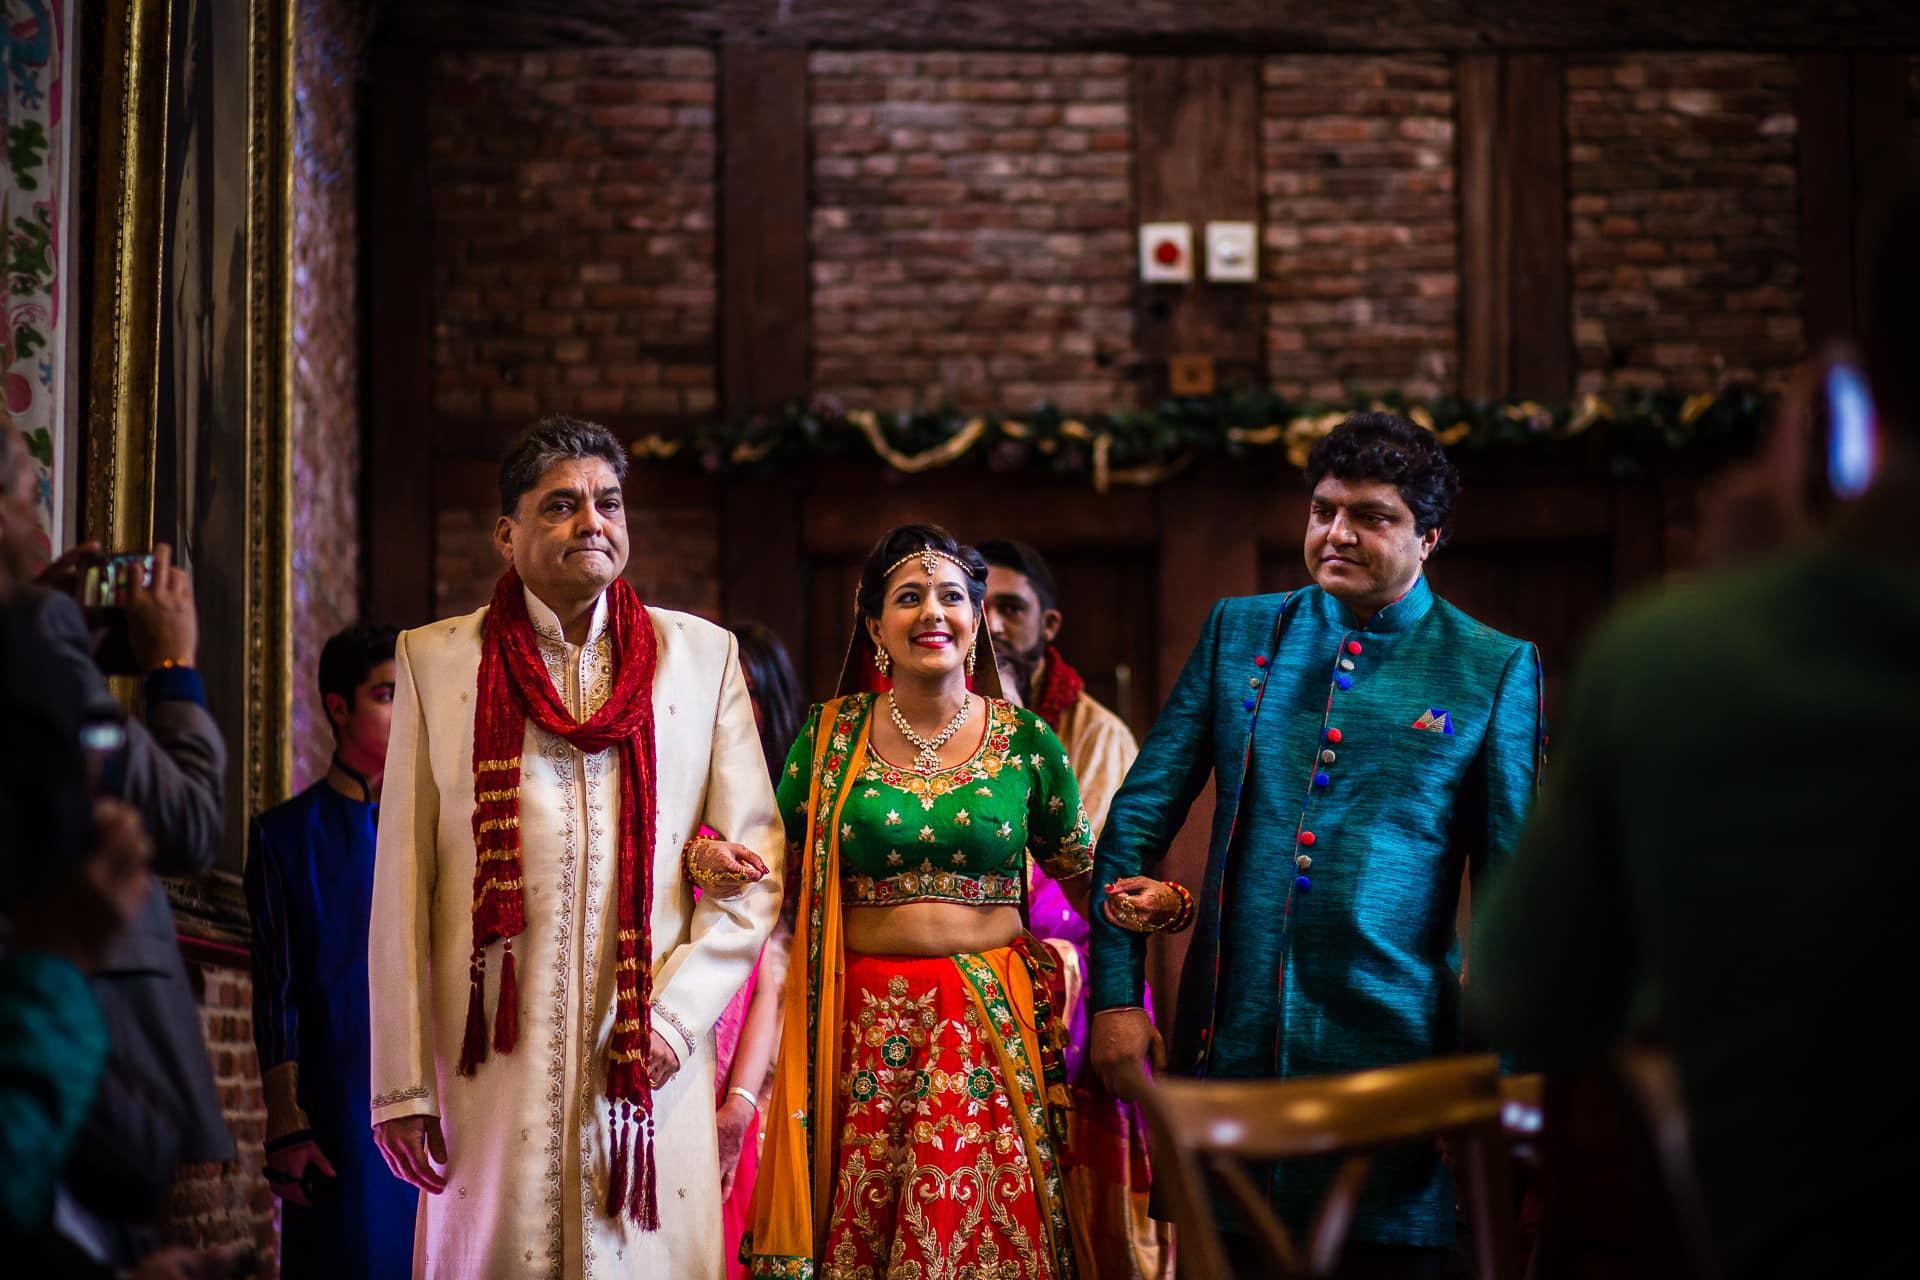 Bridal entrance during Hindu wedding